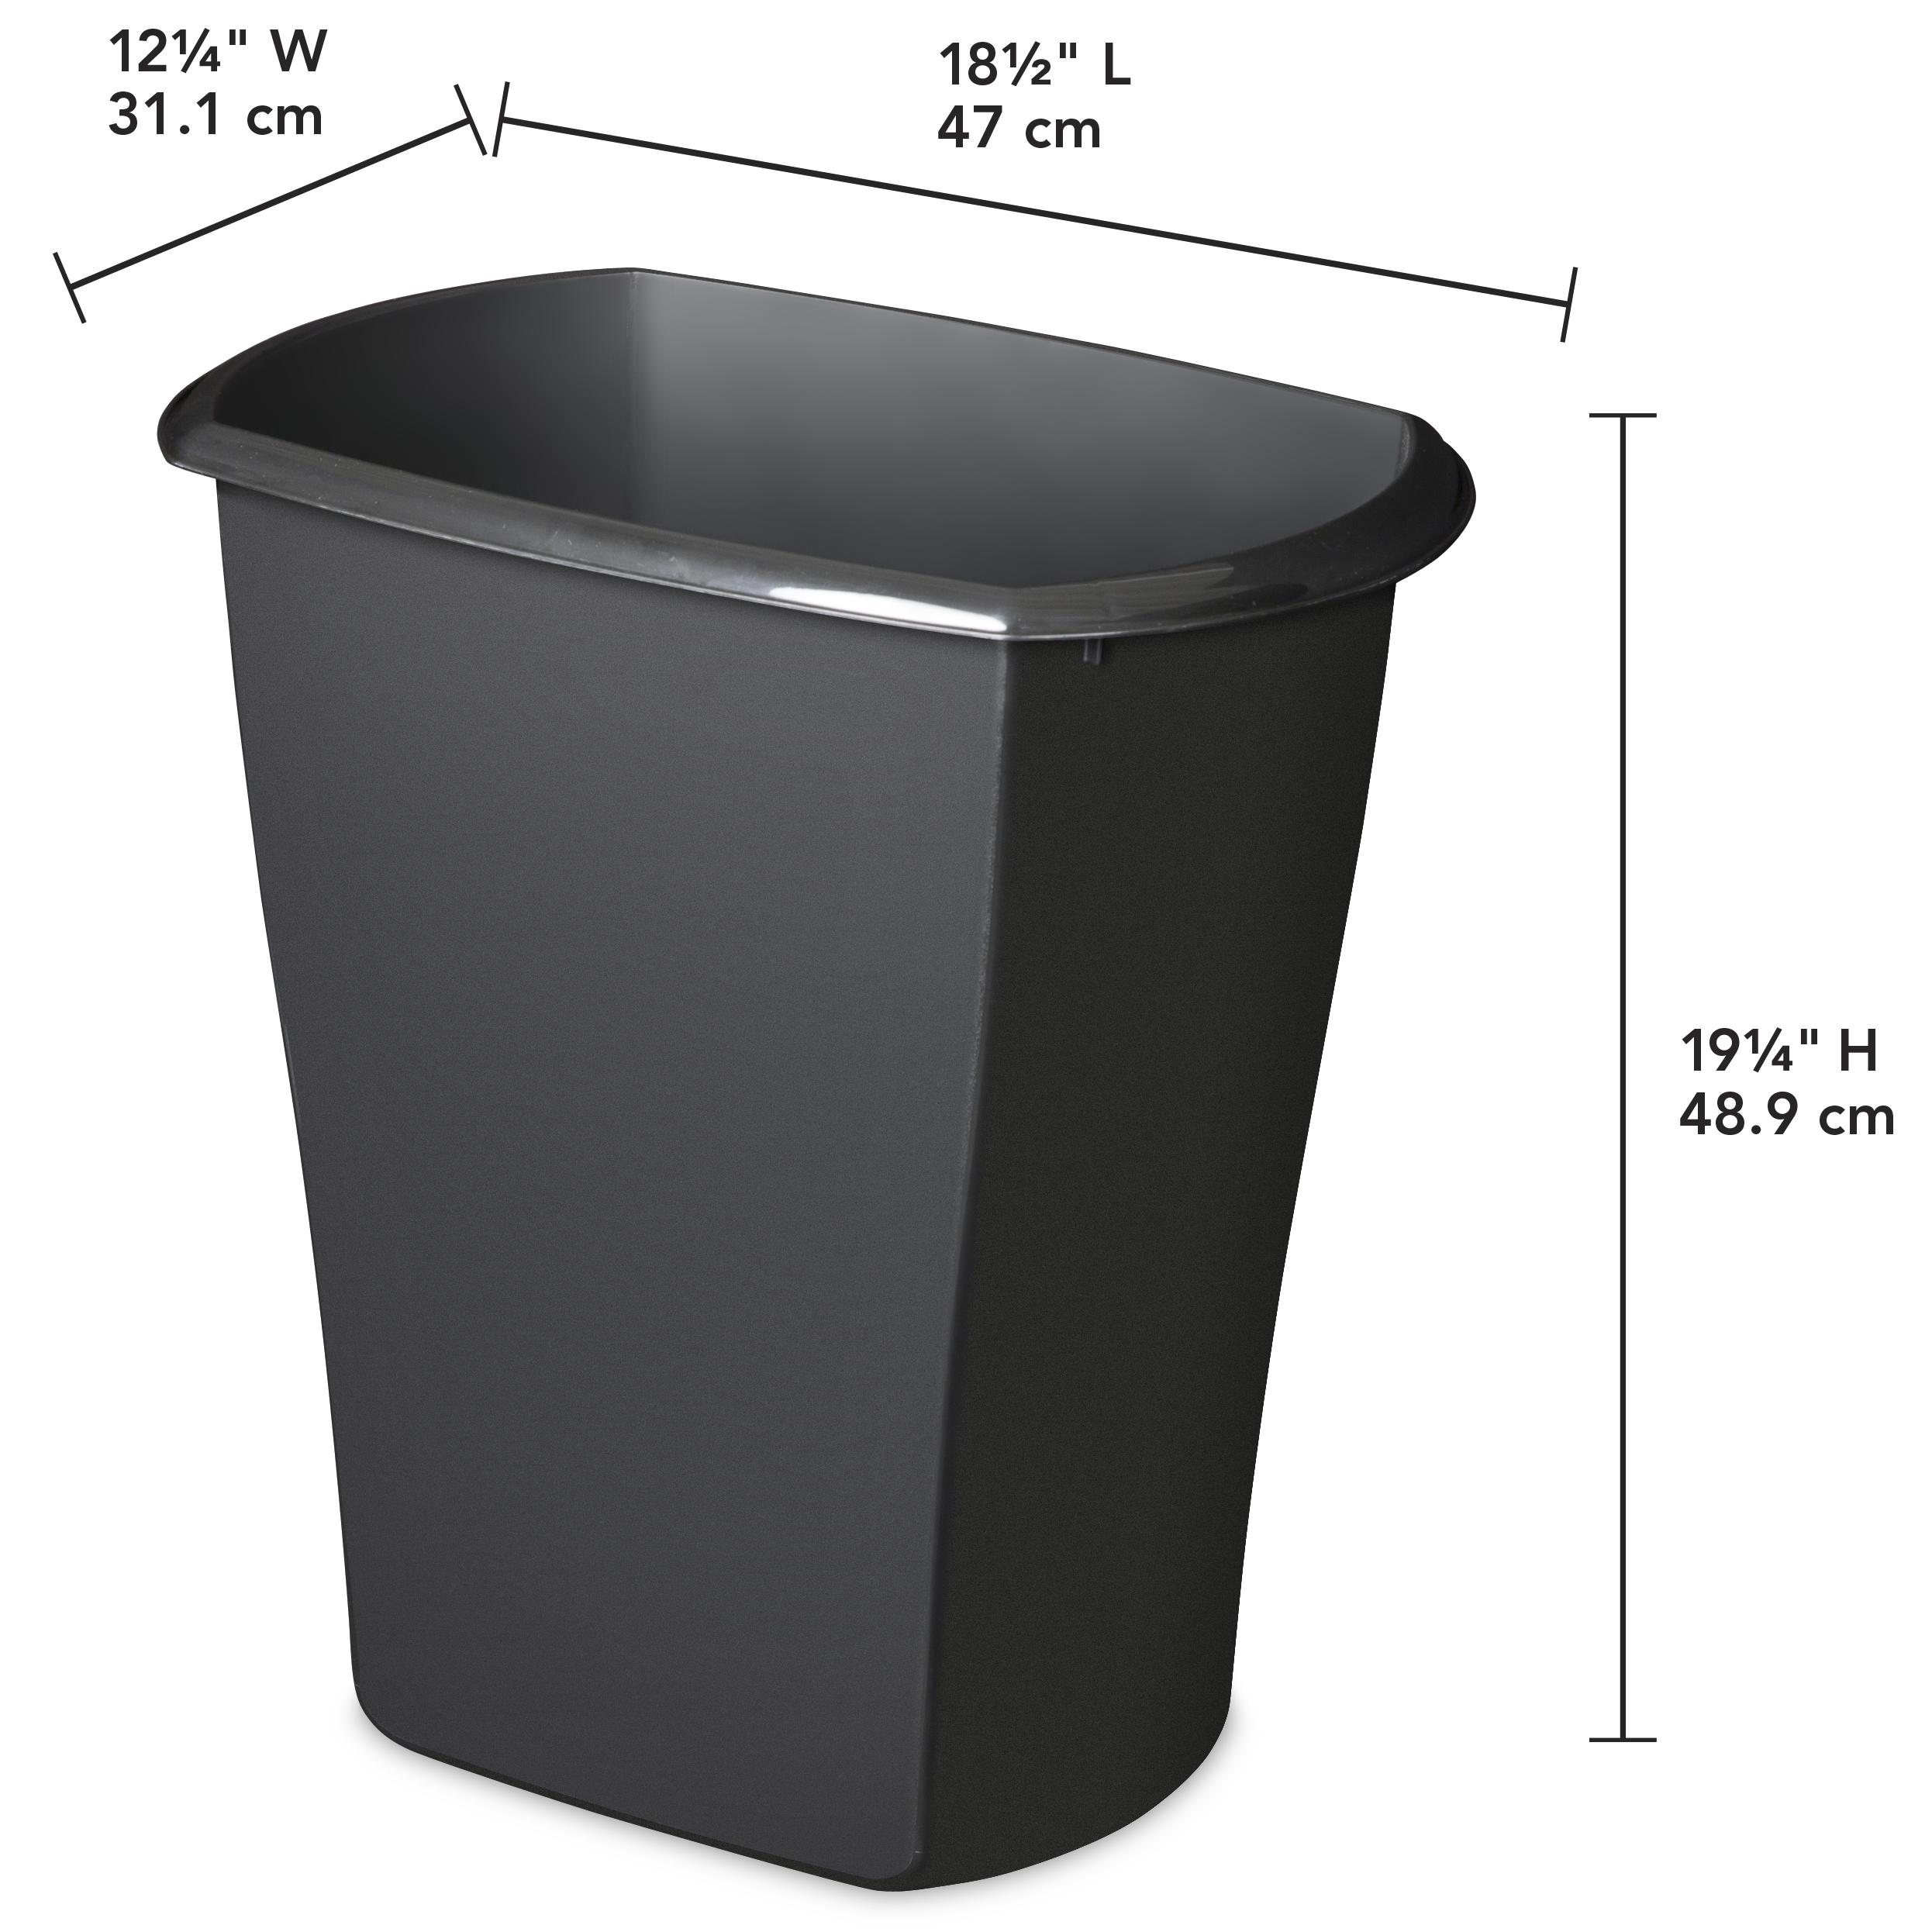 Sterilite, 10 Gal./38 L Rectangular Wastebasket, Pack of 6 in Black $14.99